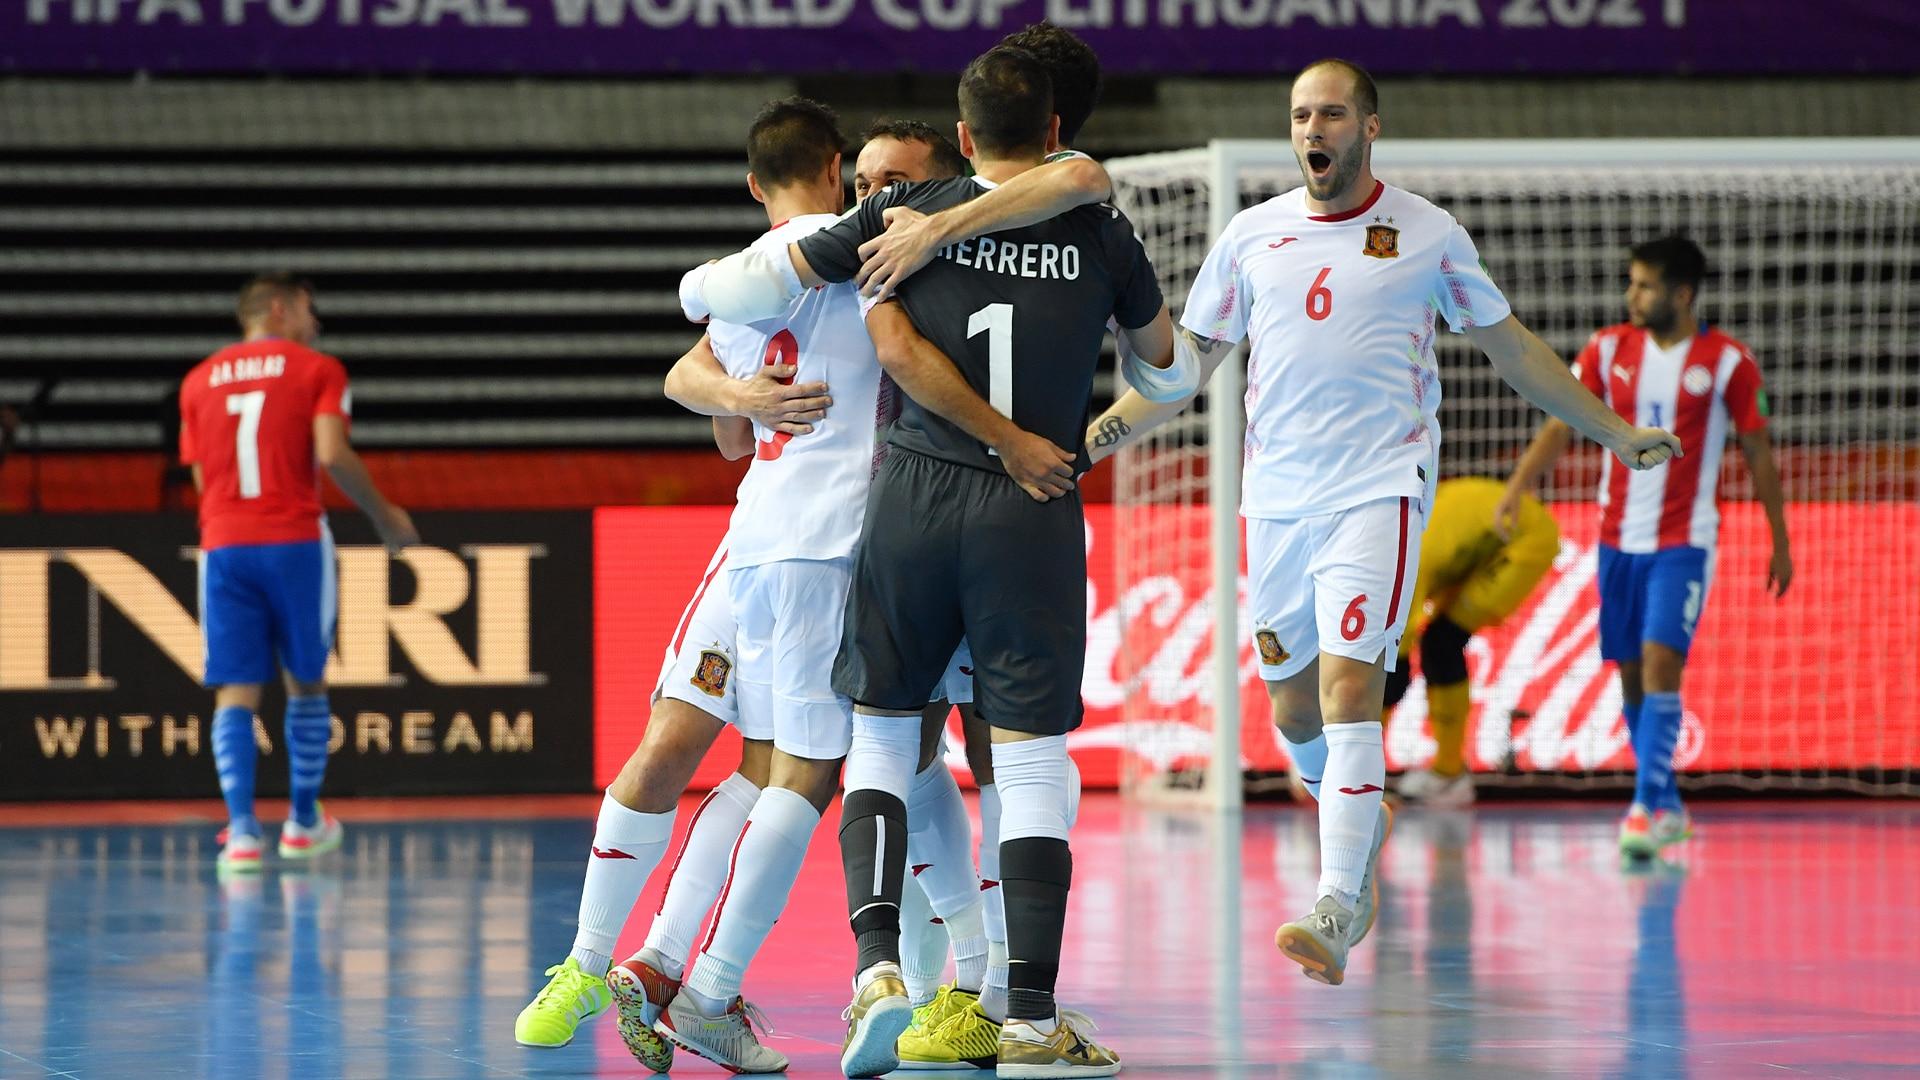 Watch FIFA Futsal World Cup Lithuania 2021 Highlight: Paraguay vs. España 0-4 - NBC.com